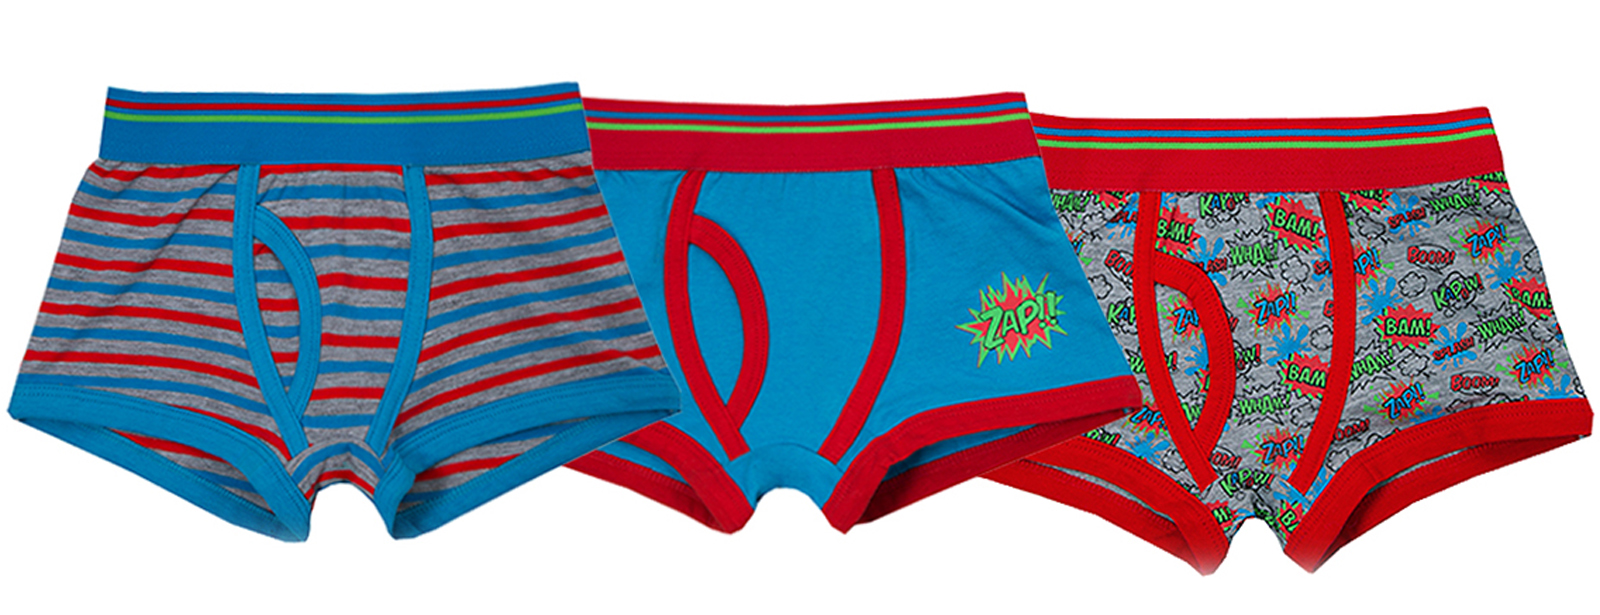 Kids Boys Boxer Shorts 3 Pairs Pack Childrens Cotton Blend Underwear Trunks Size